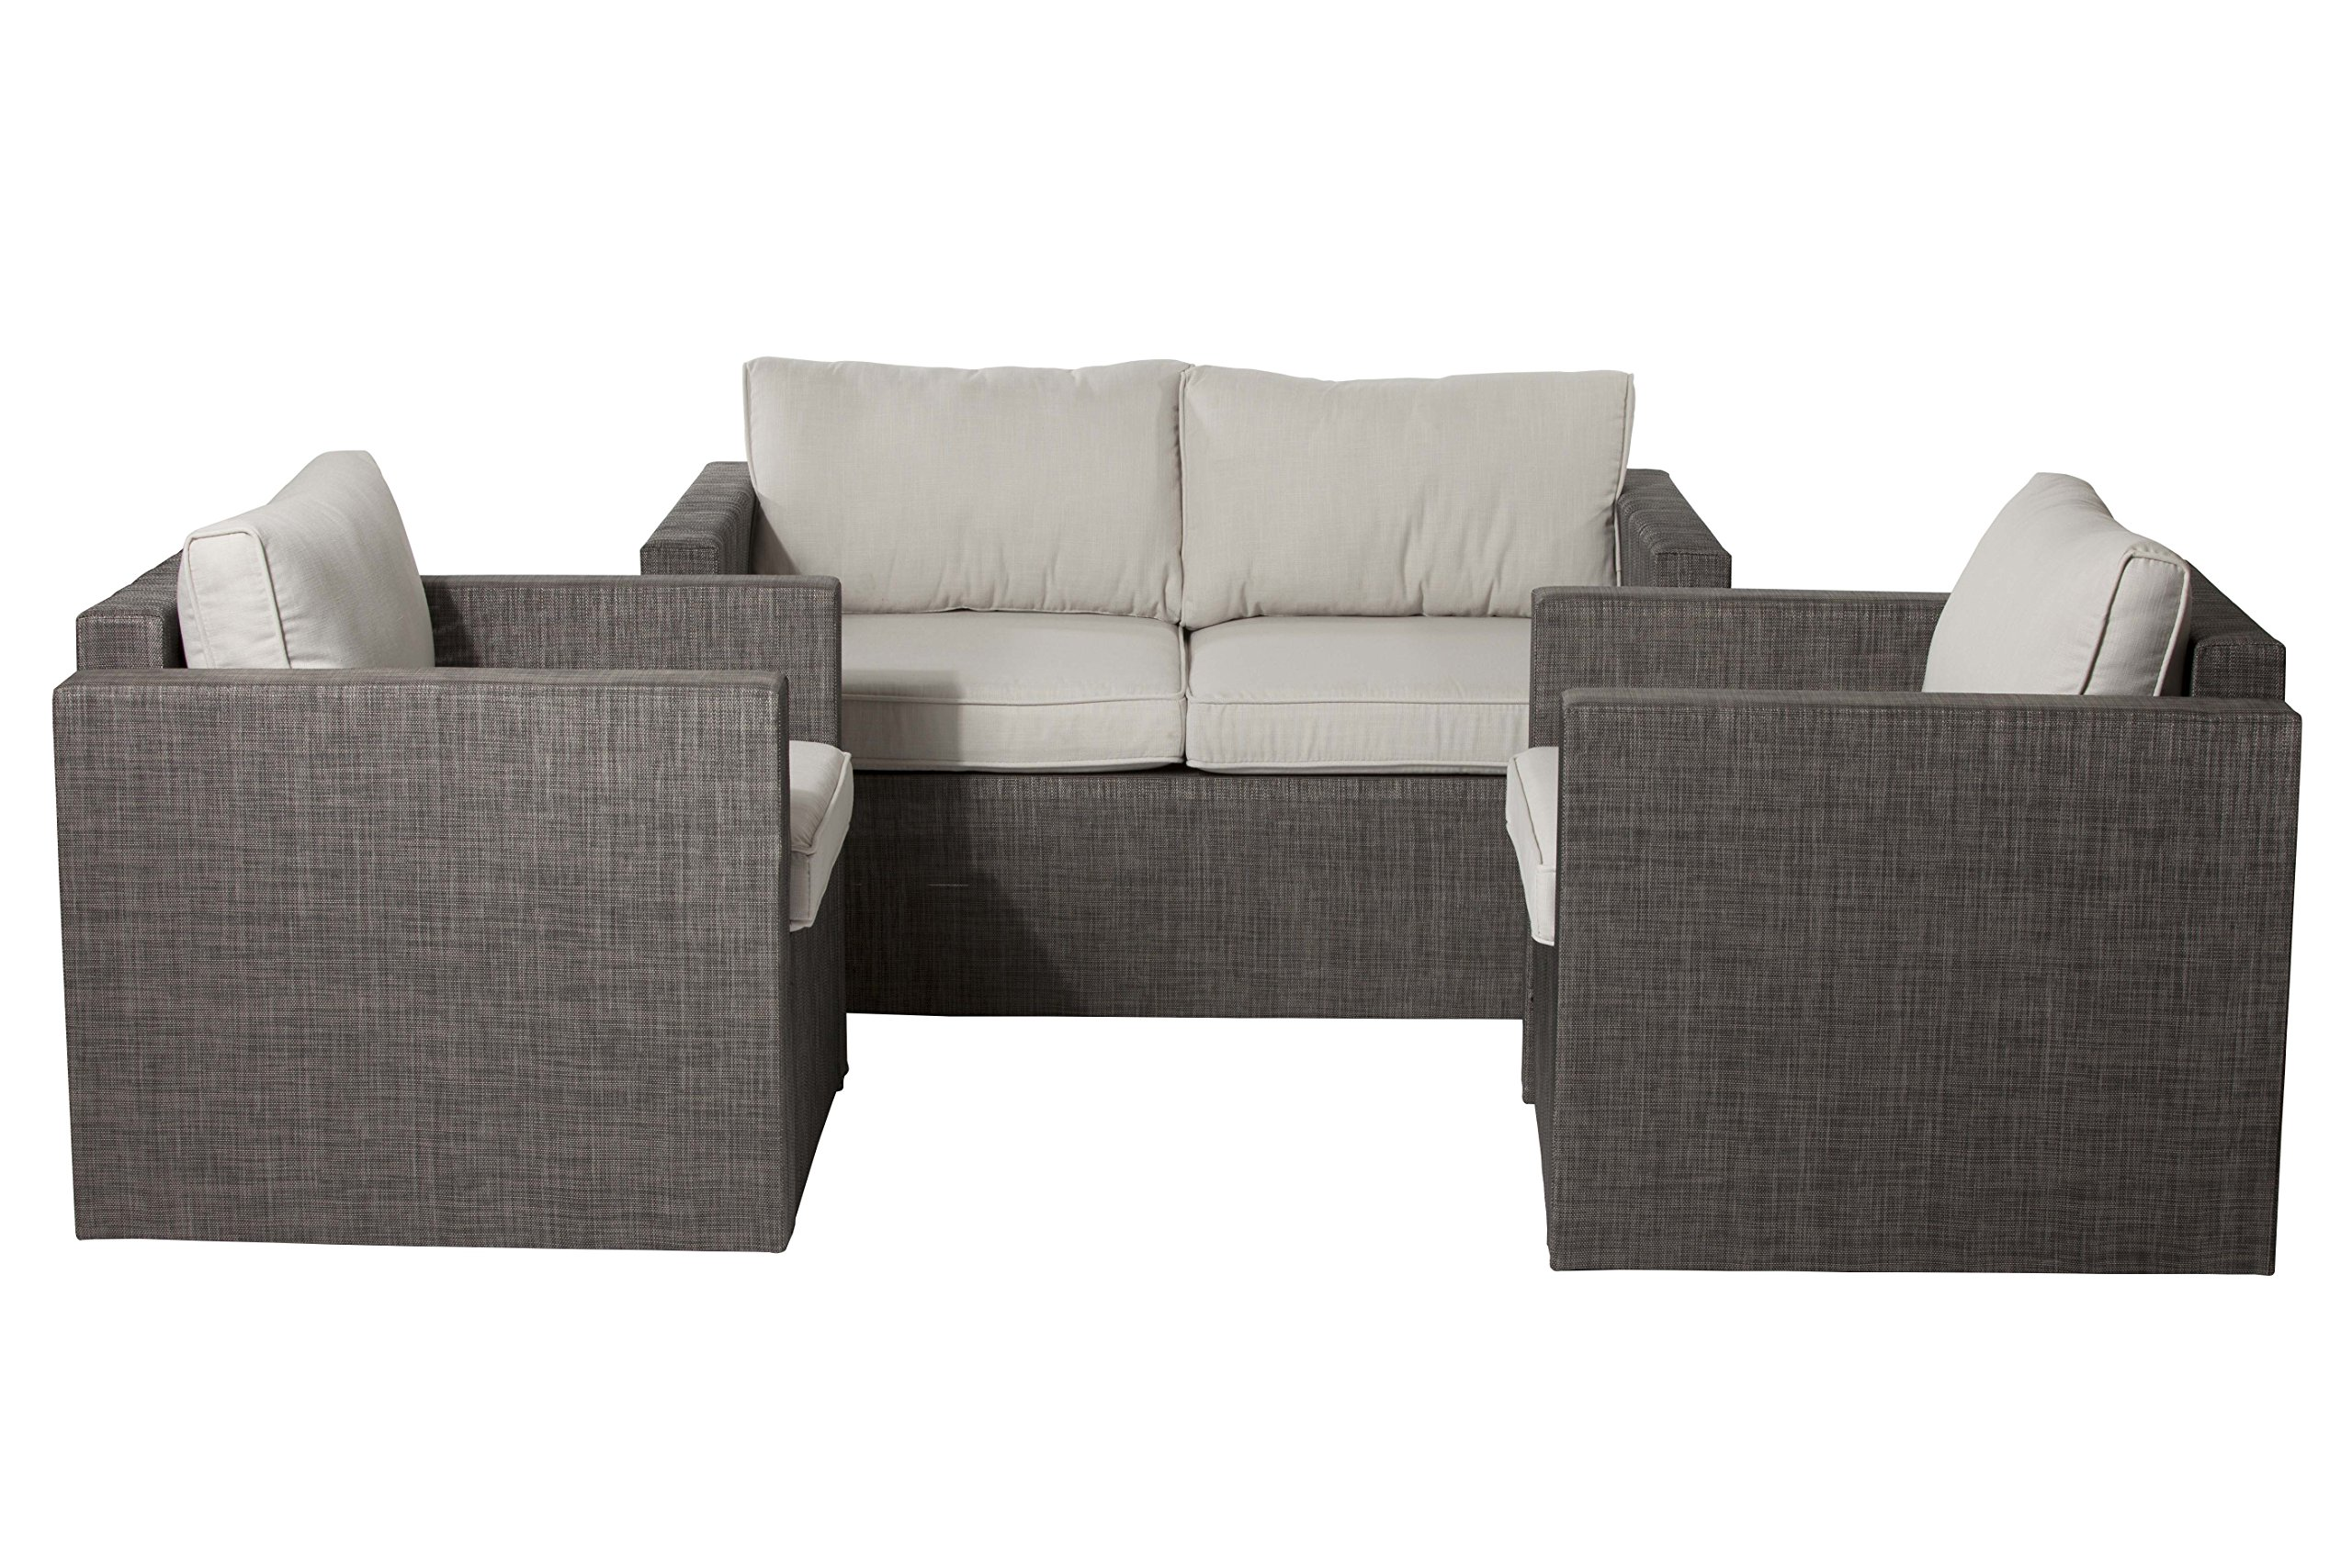 Pangea Home 1+2 Lion Sofa Set Textilene Gold White - Manufacturer: Pangea Home Material Type: aluminum Color NAME: White - patio-furniture, patio, conversation-sets - 91H0rs fmBL -